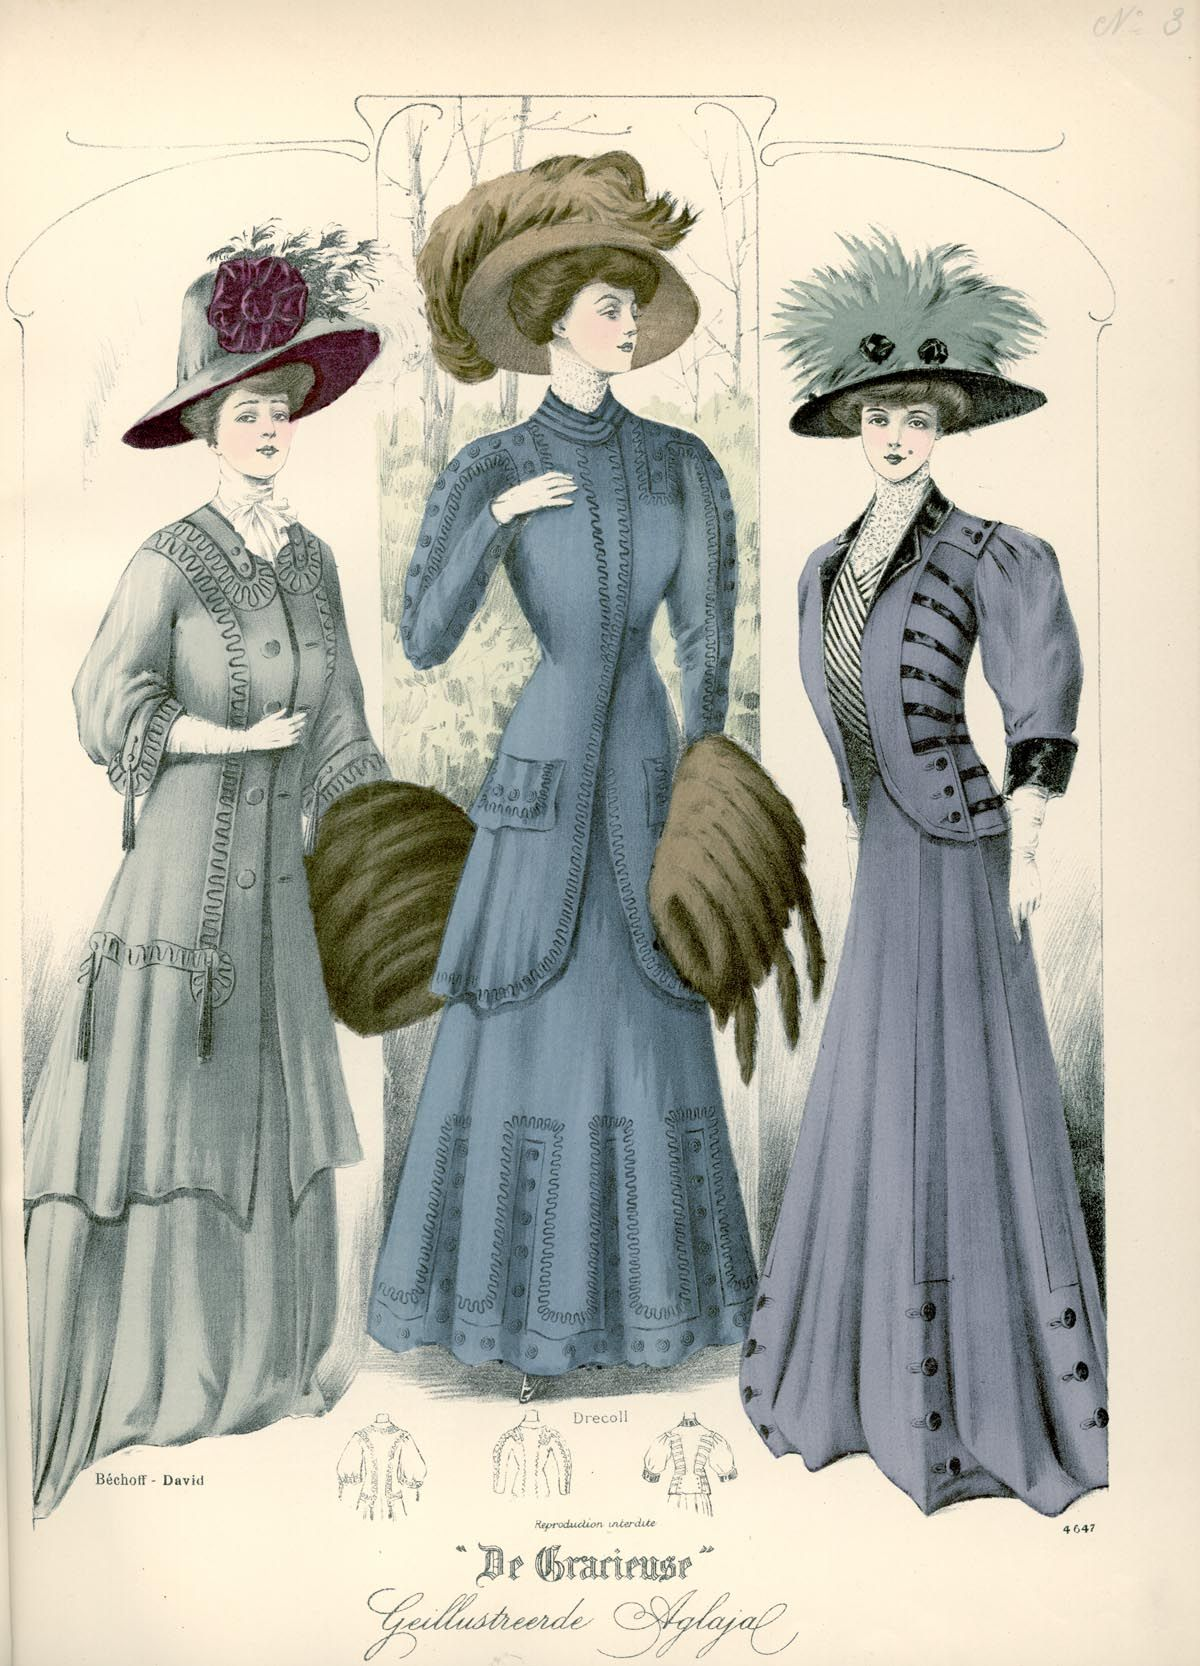 [De Gracieuse] Visite- en wandeltoiletten (February 1908)